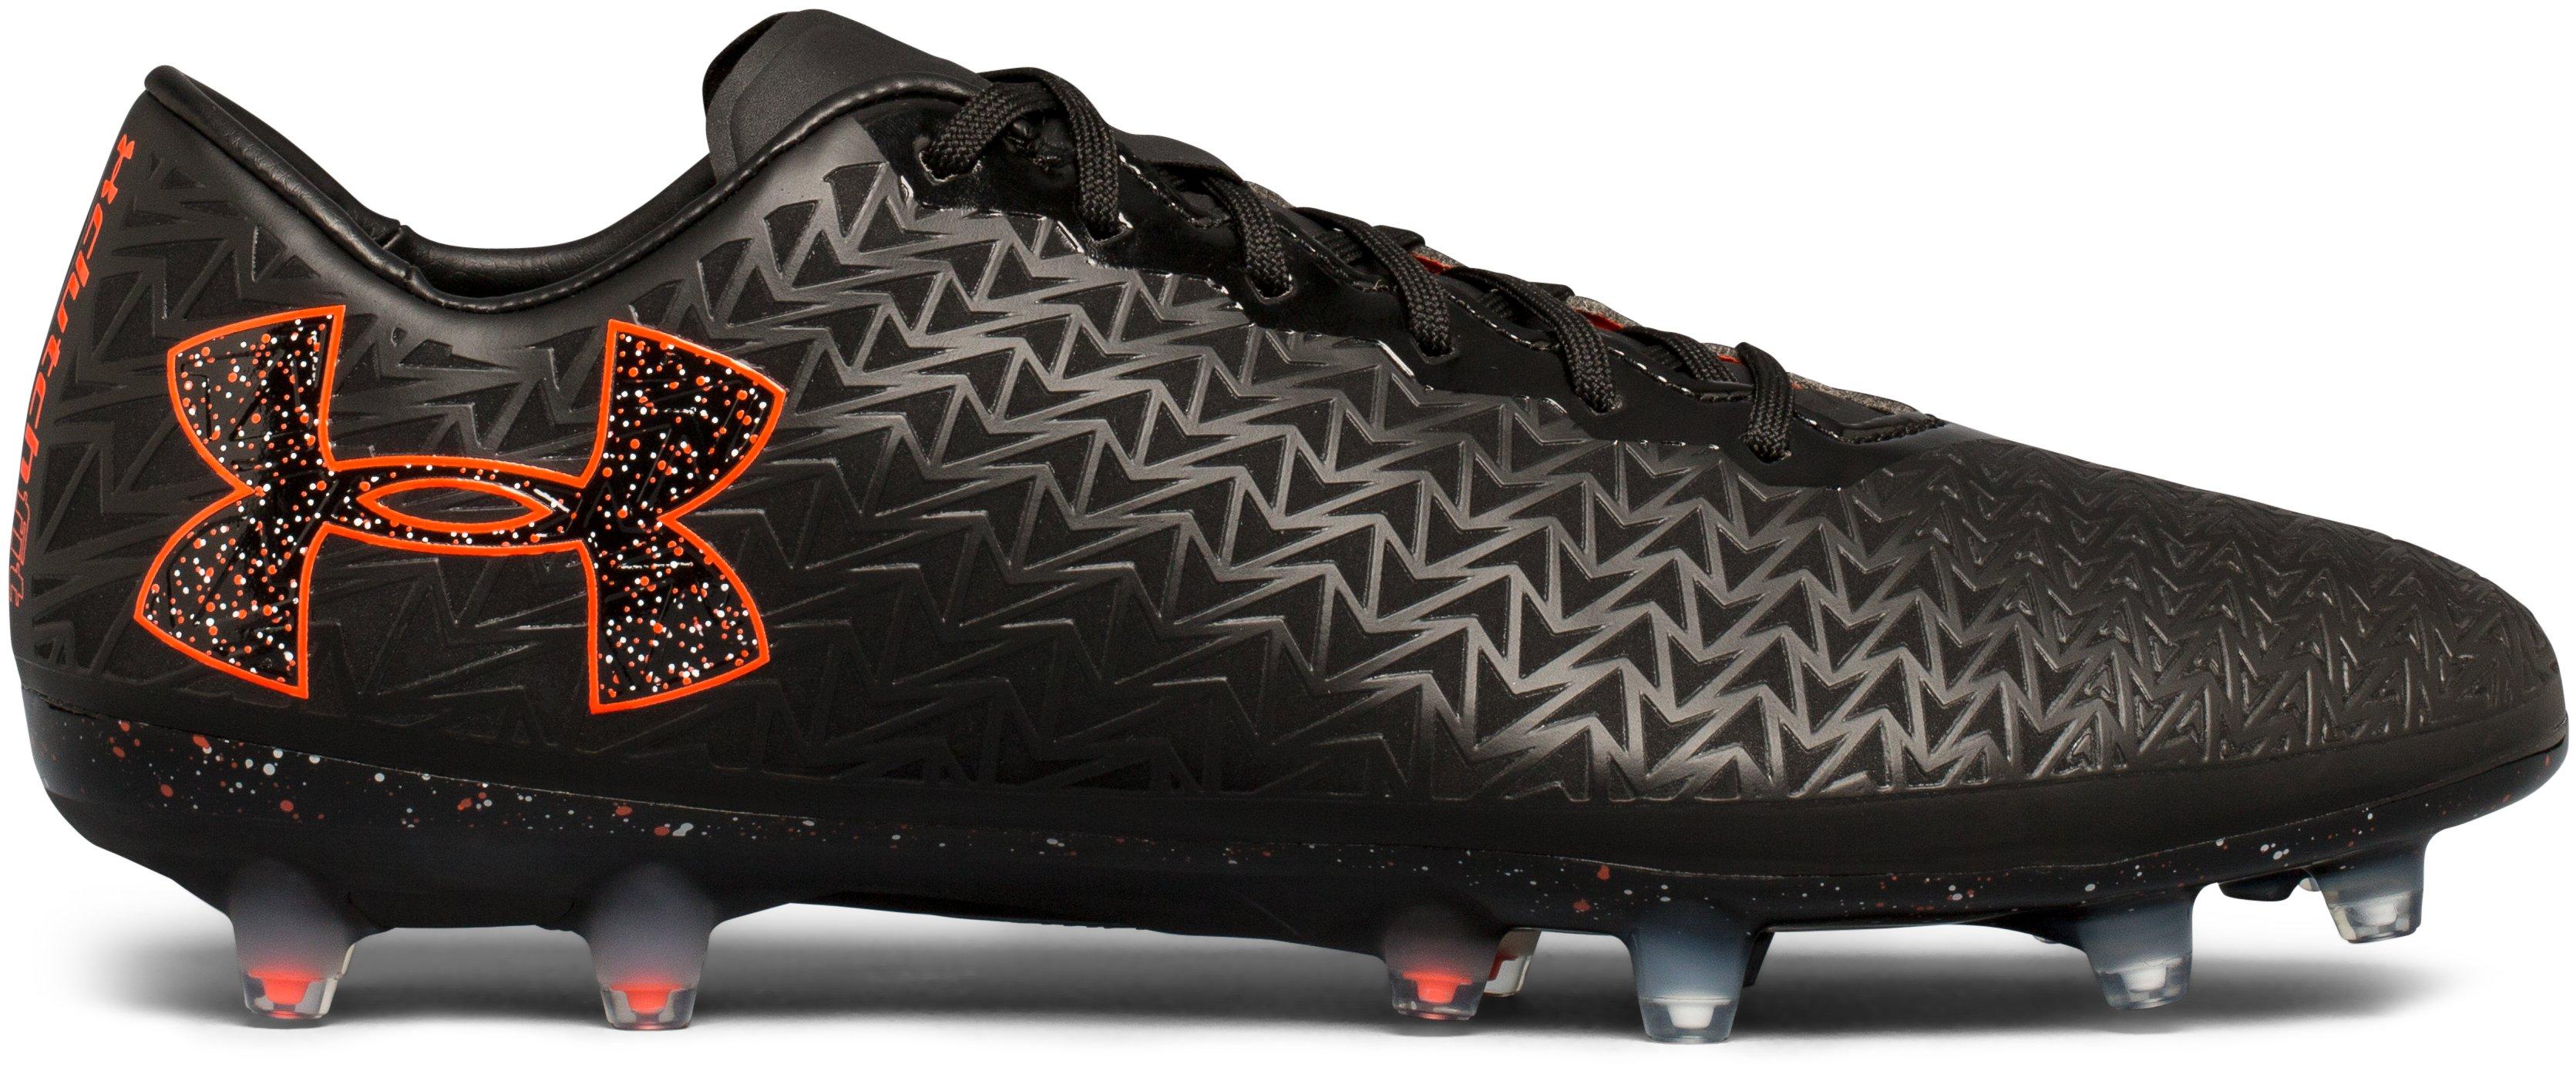 Zapatos de Futbol UA Clutchfit Force 3.0 FG para Hombre, 360 degree view